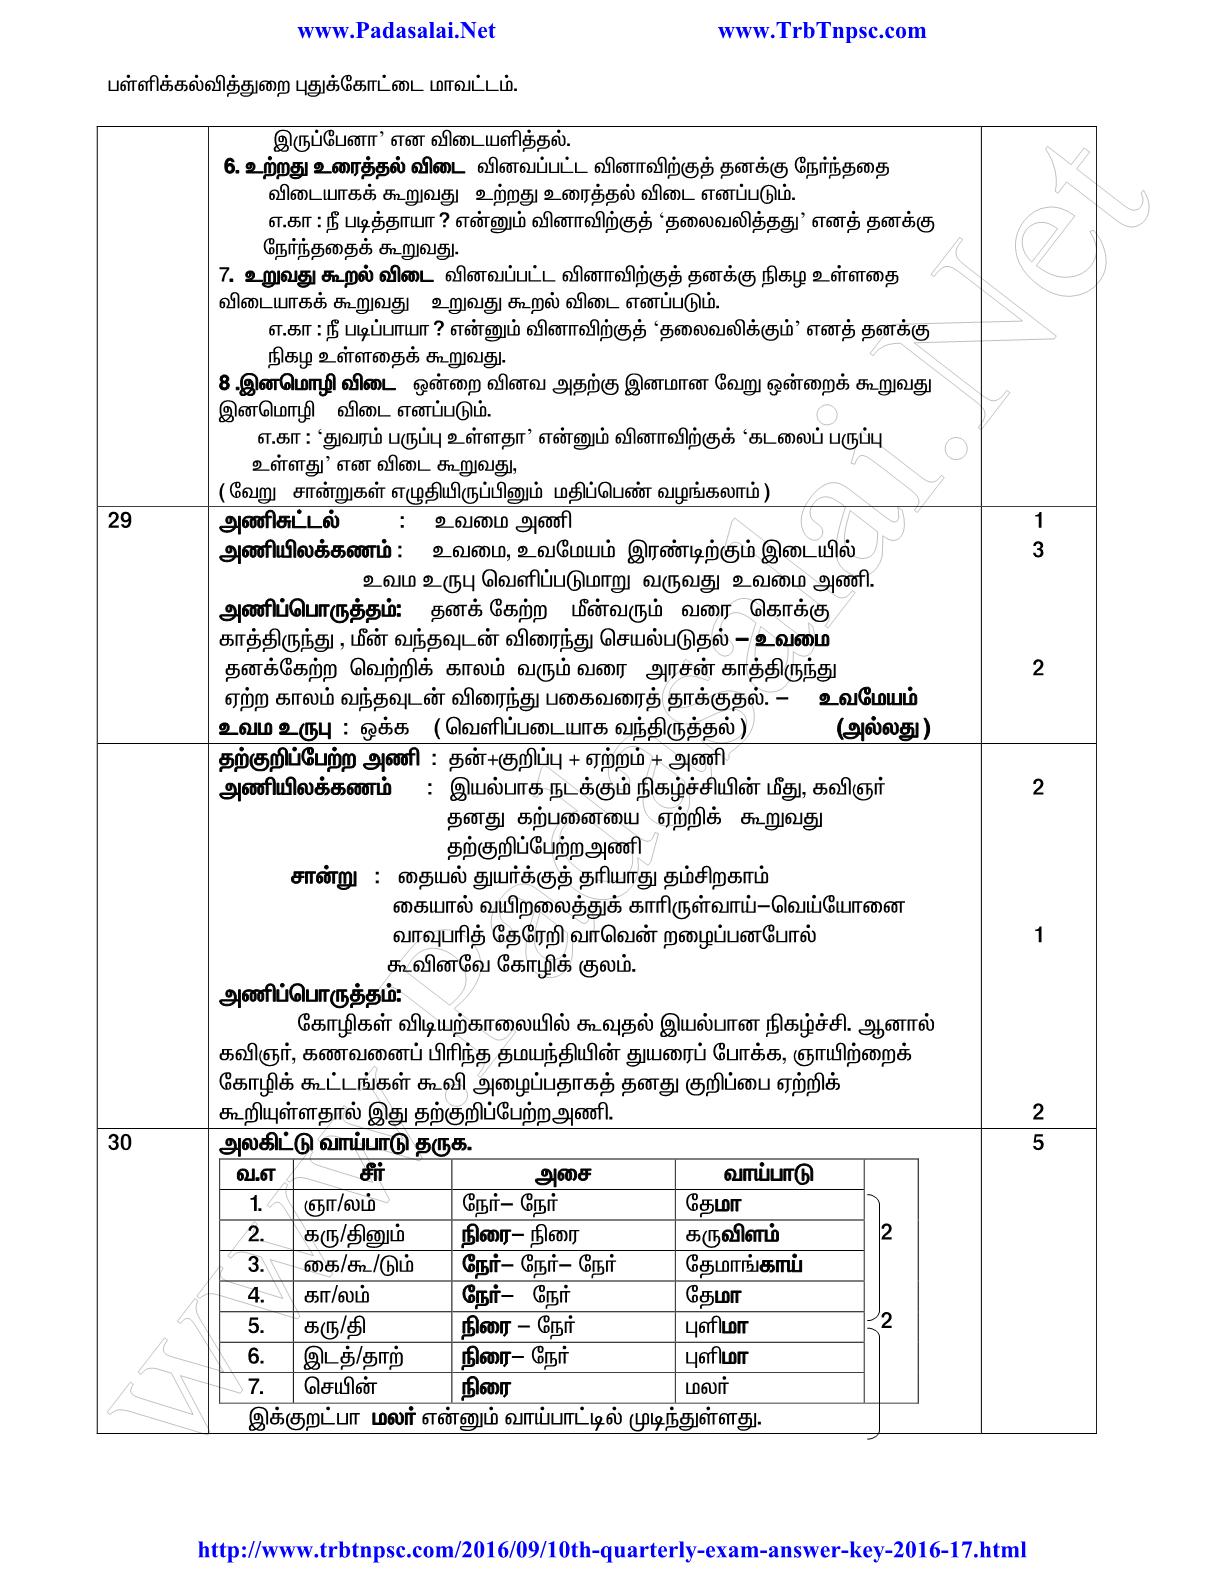 SSLC Quarterly Exam Key Answer 2016-17 for Tamil Paper 2 ~ Padasalai